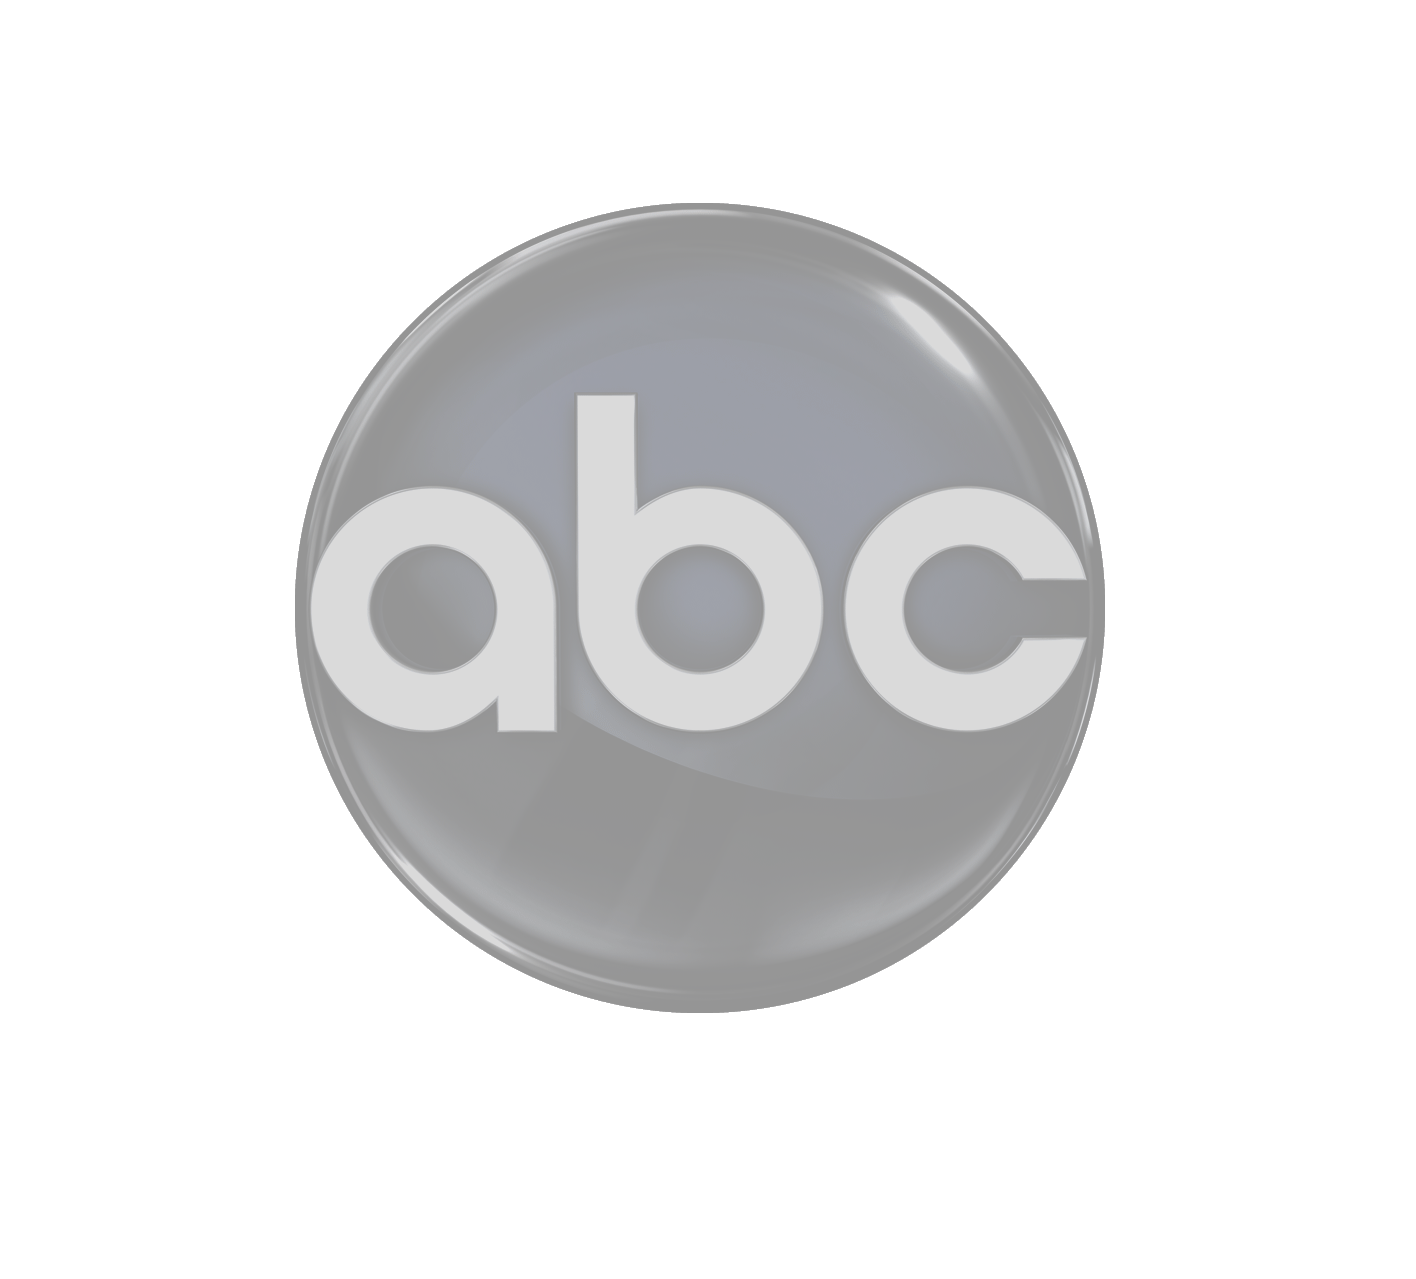 abc-logo-png-abc-logo-2008-png-2272.png